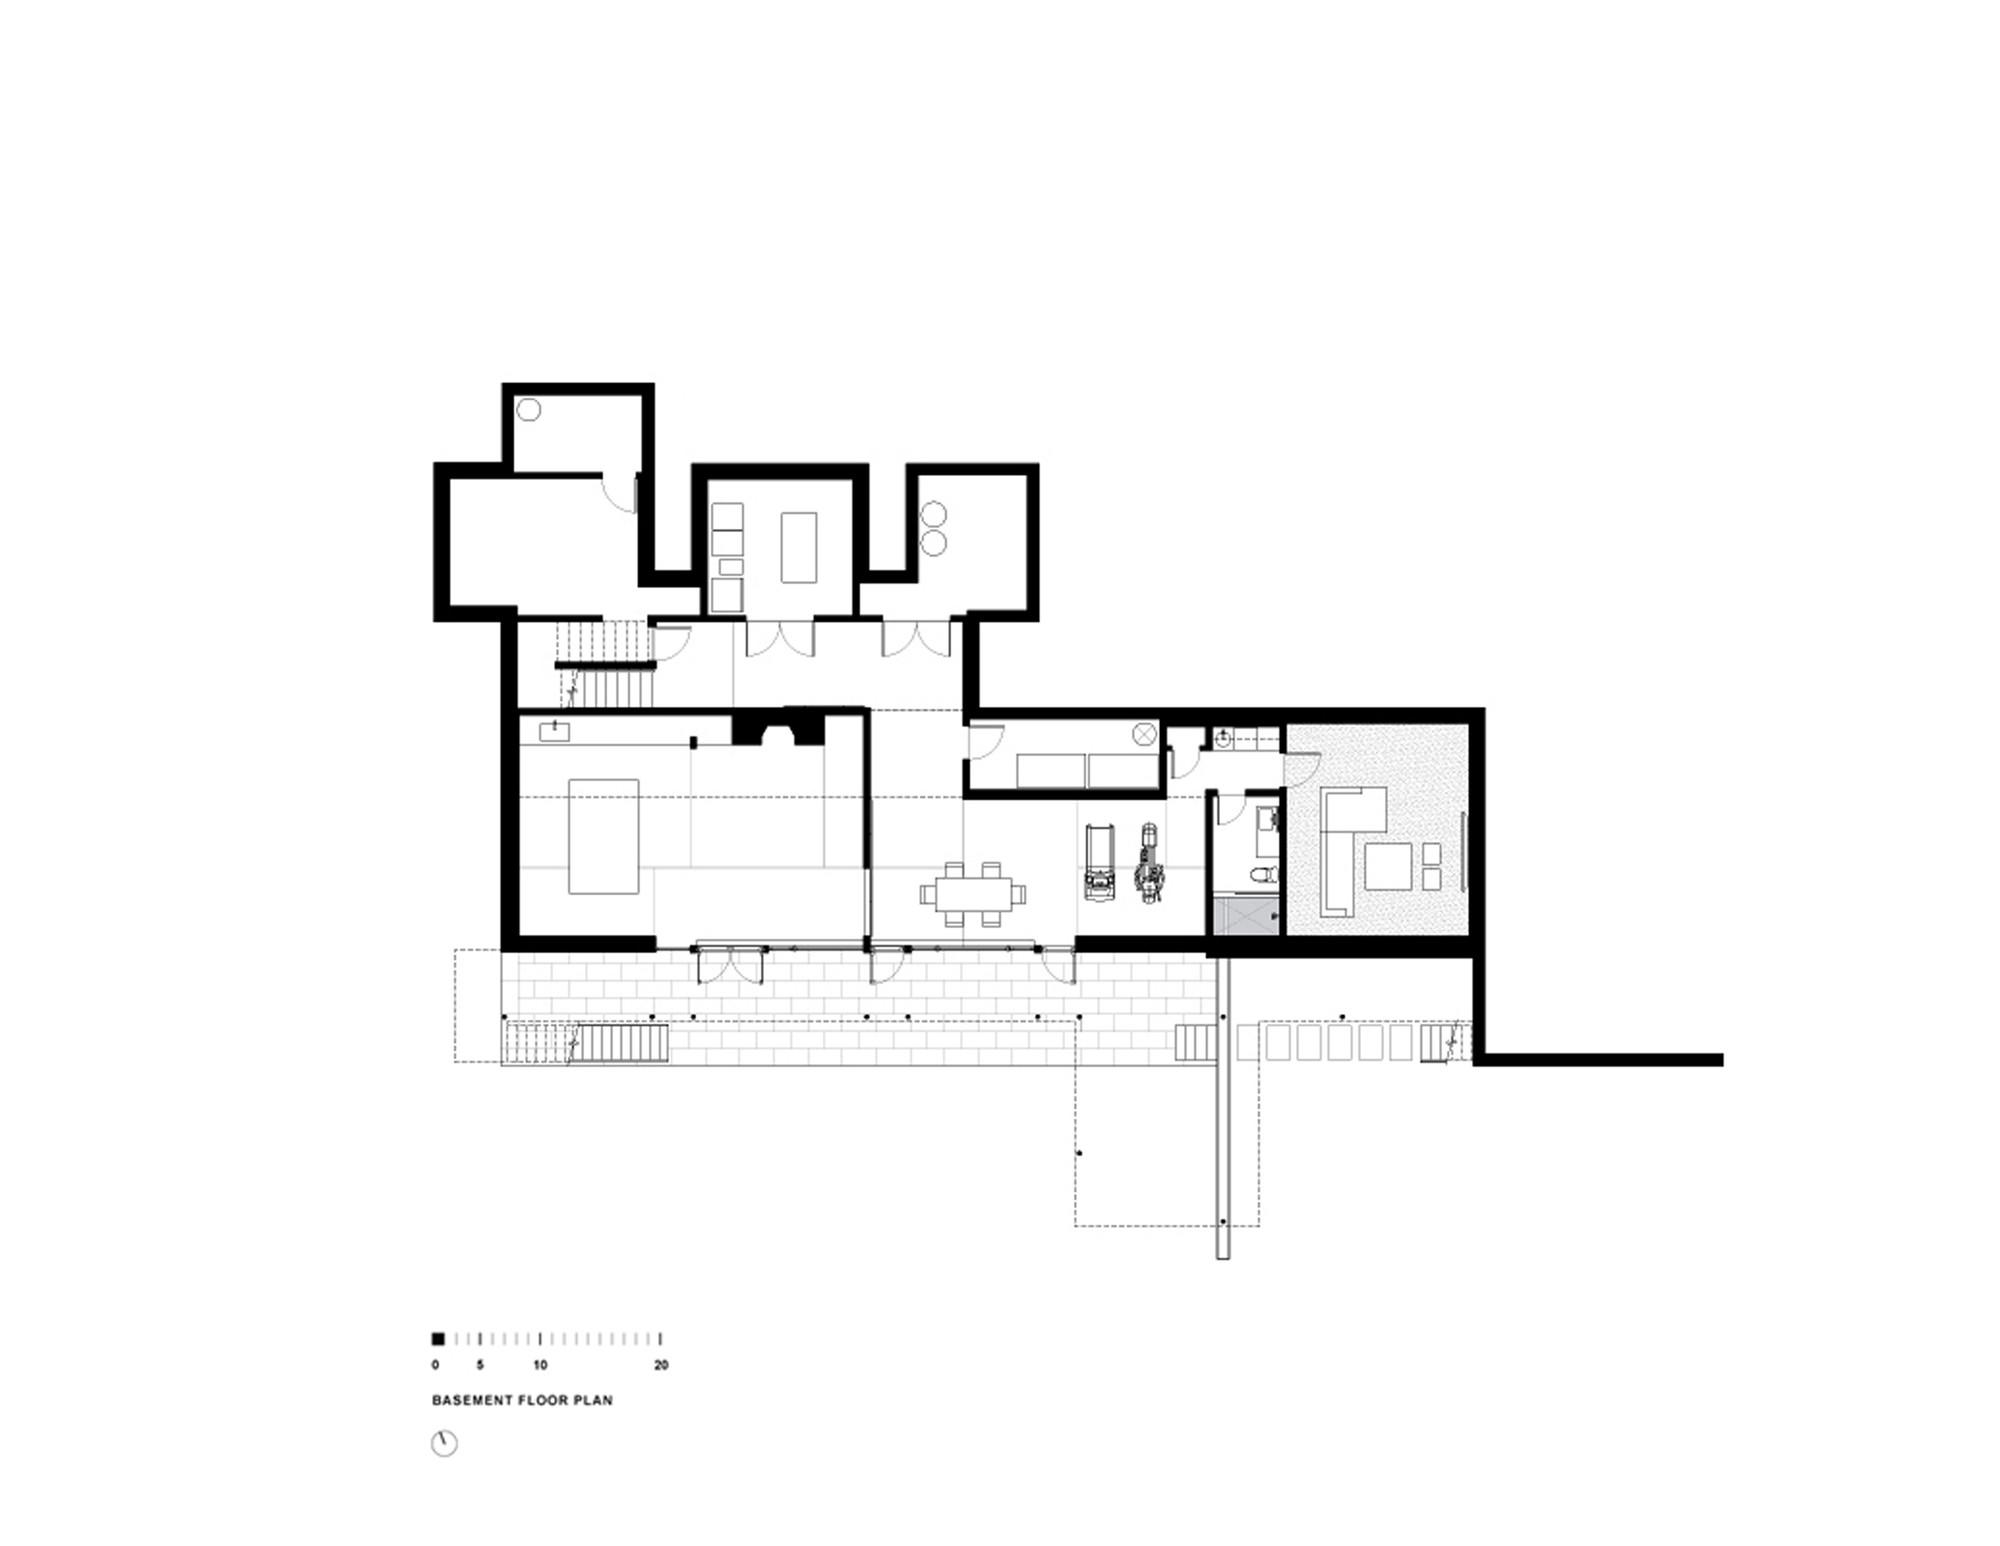 gallery of riggins house robert m gurney architect 21 riggins house basement floor plan